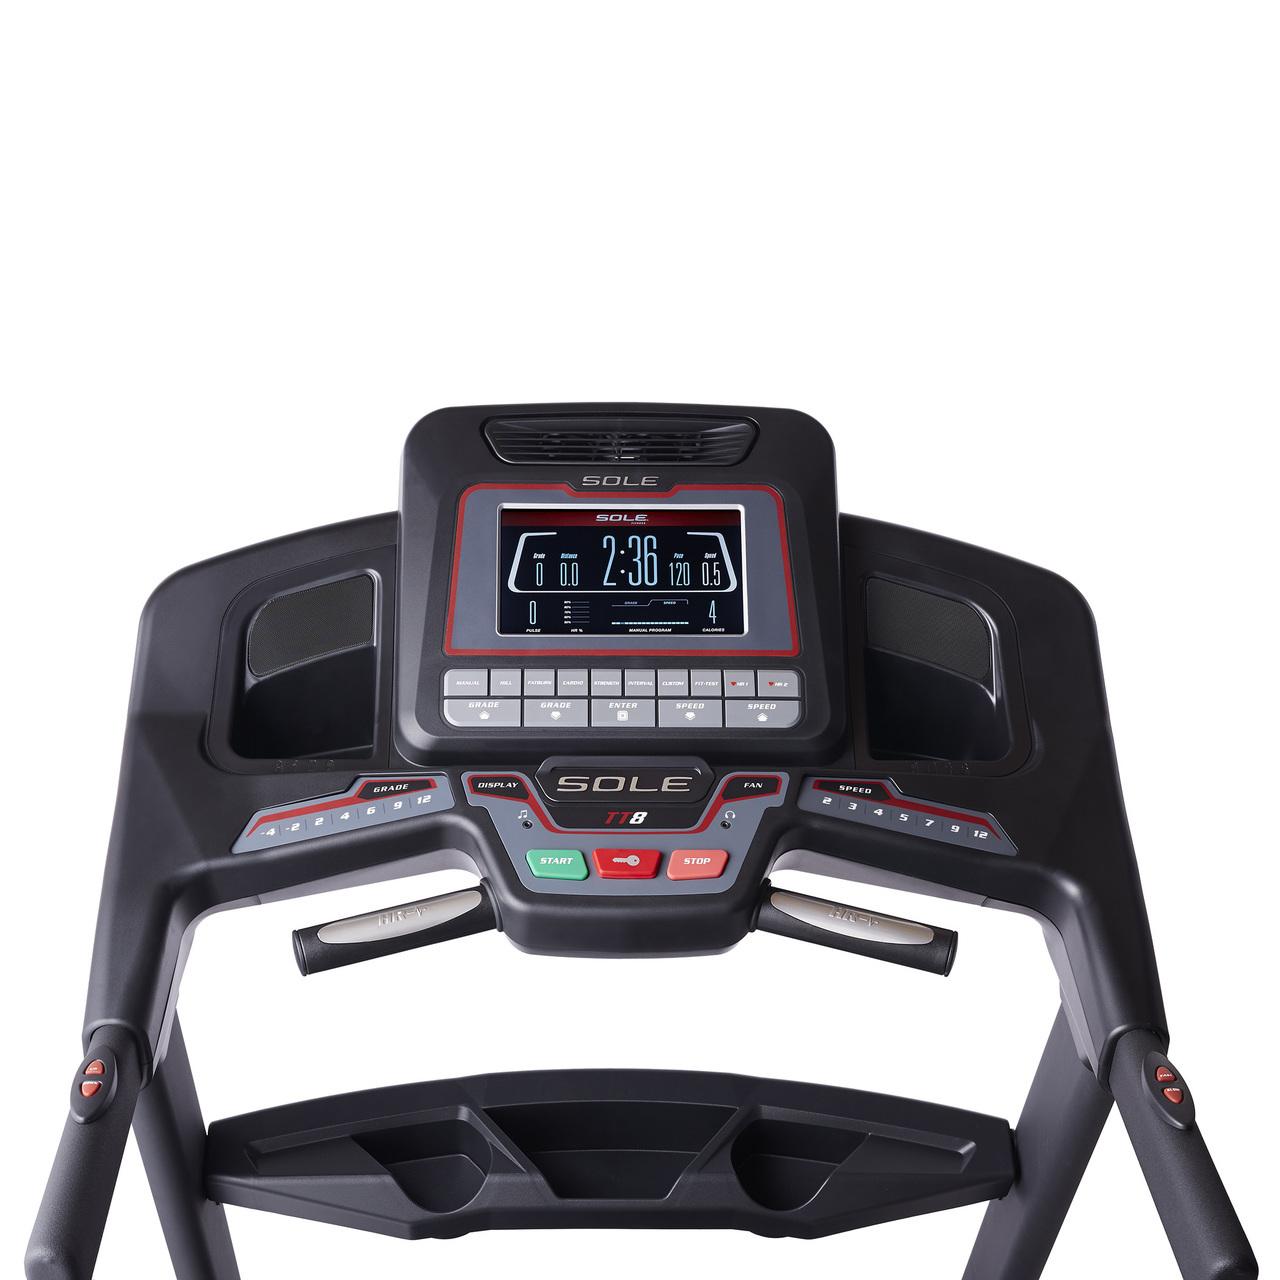 Sole Treadmill S77: Sole TT8 Treadmill -6% To 15% Incline